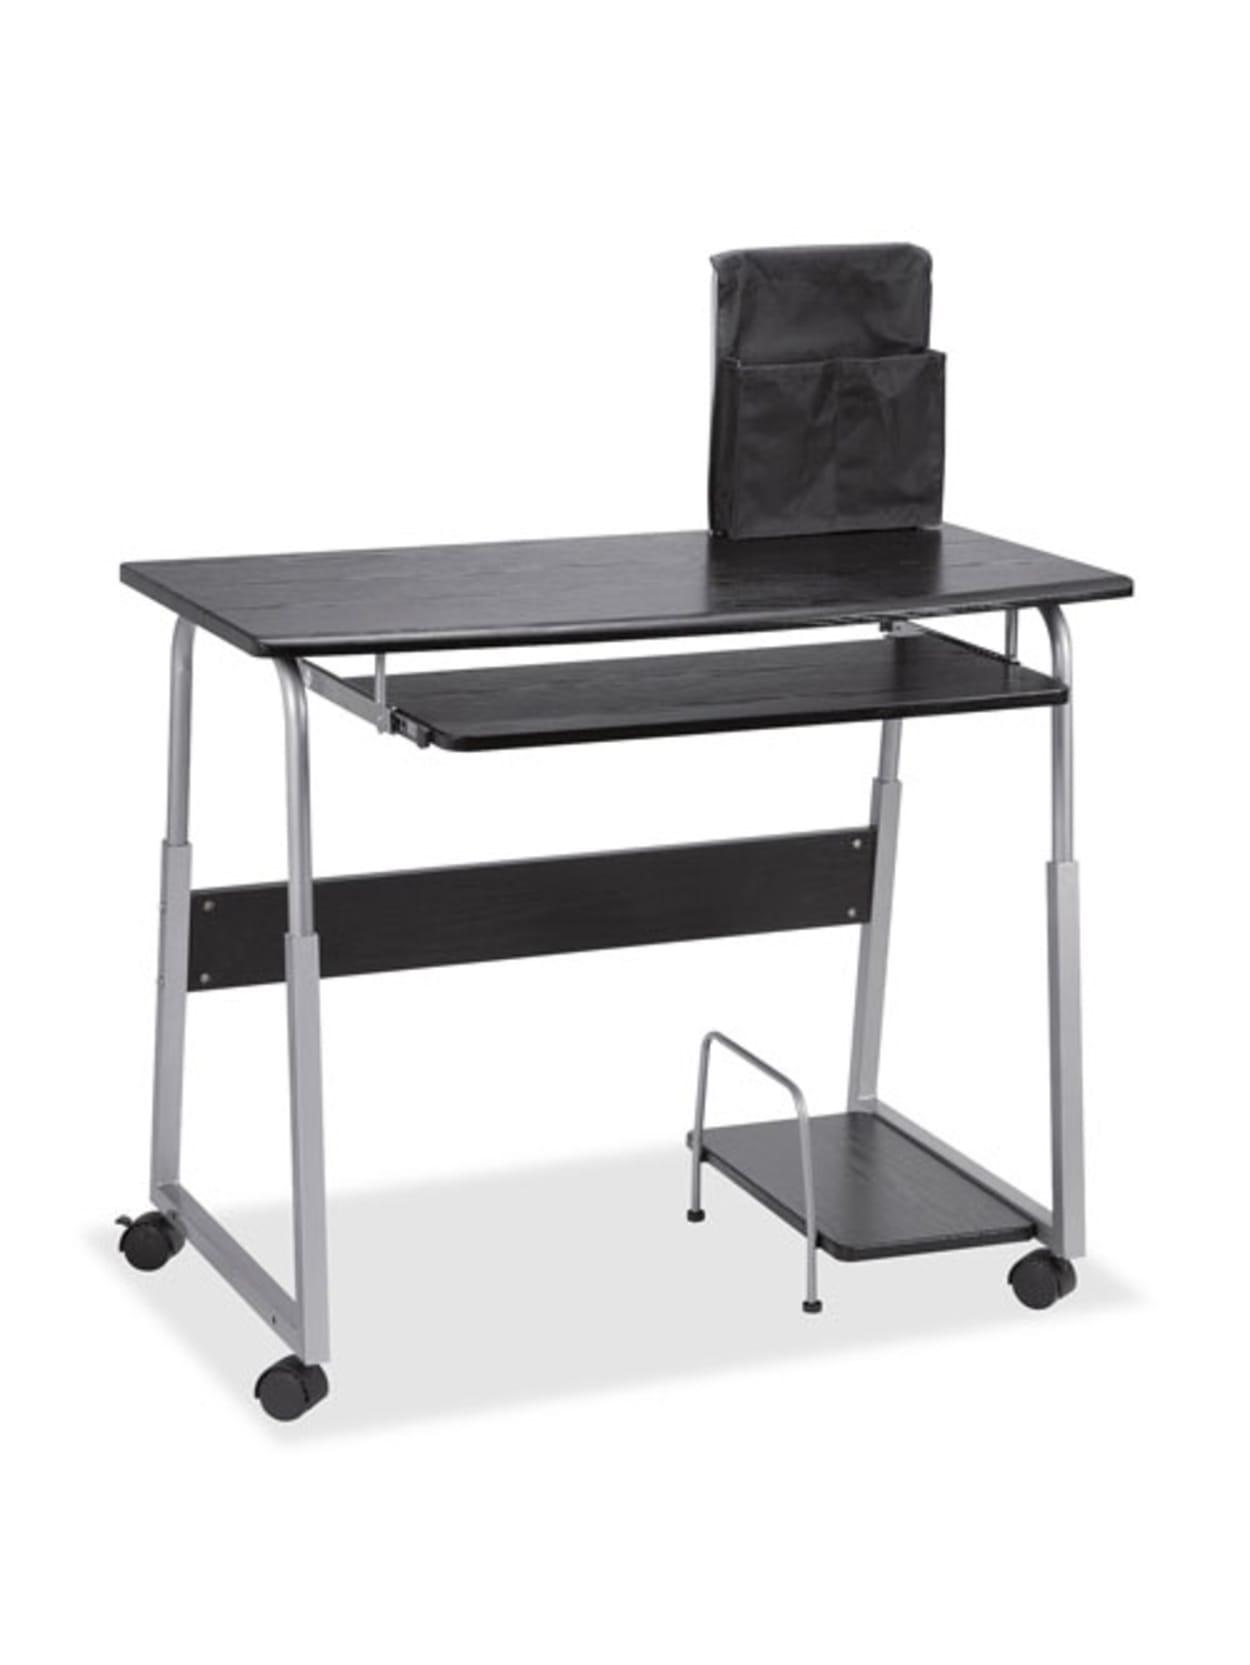 Lorell Mobile Computer Desk Blacksilver Office Depot